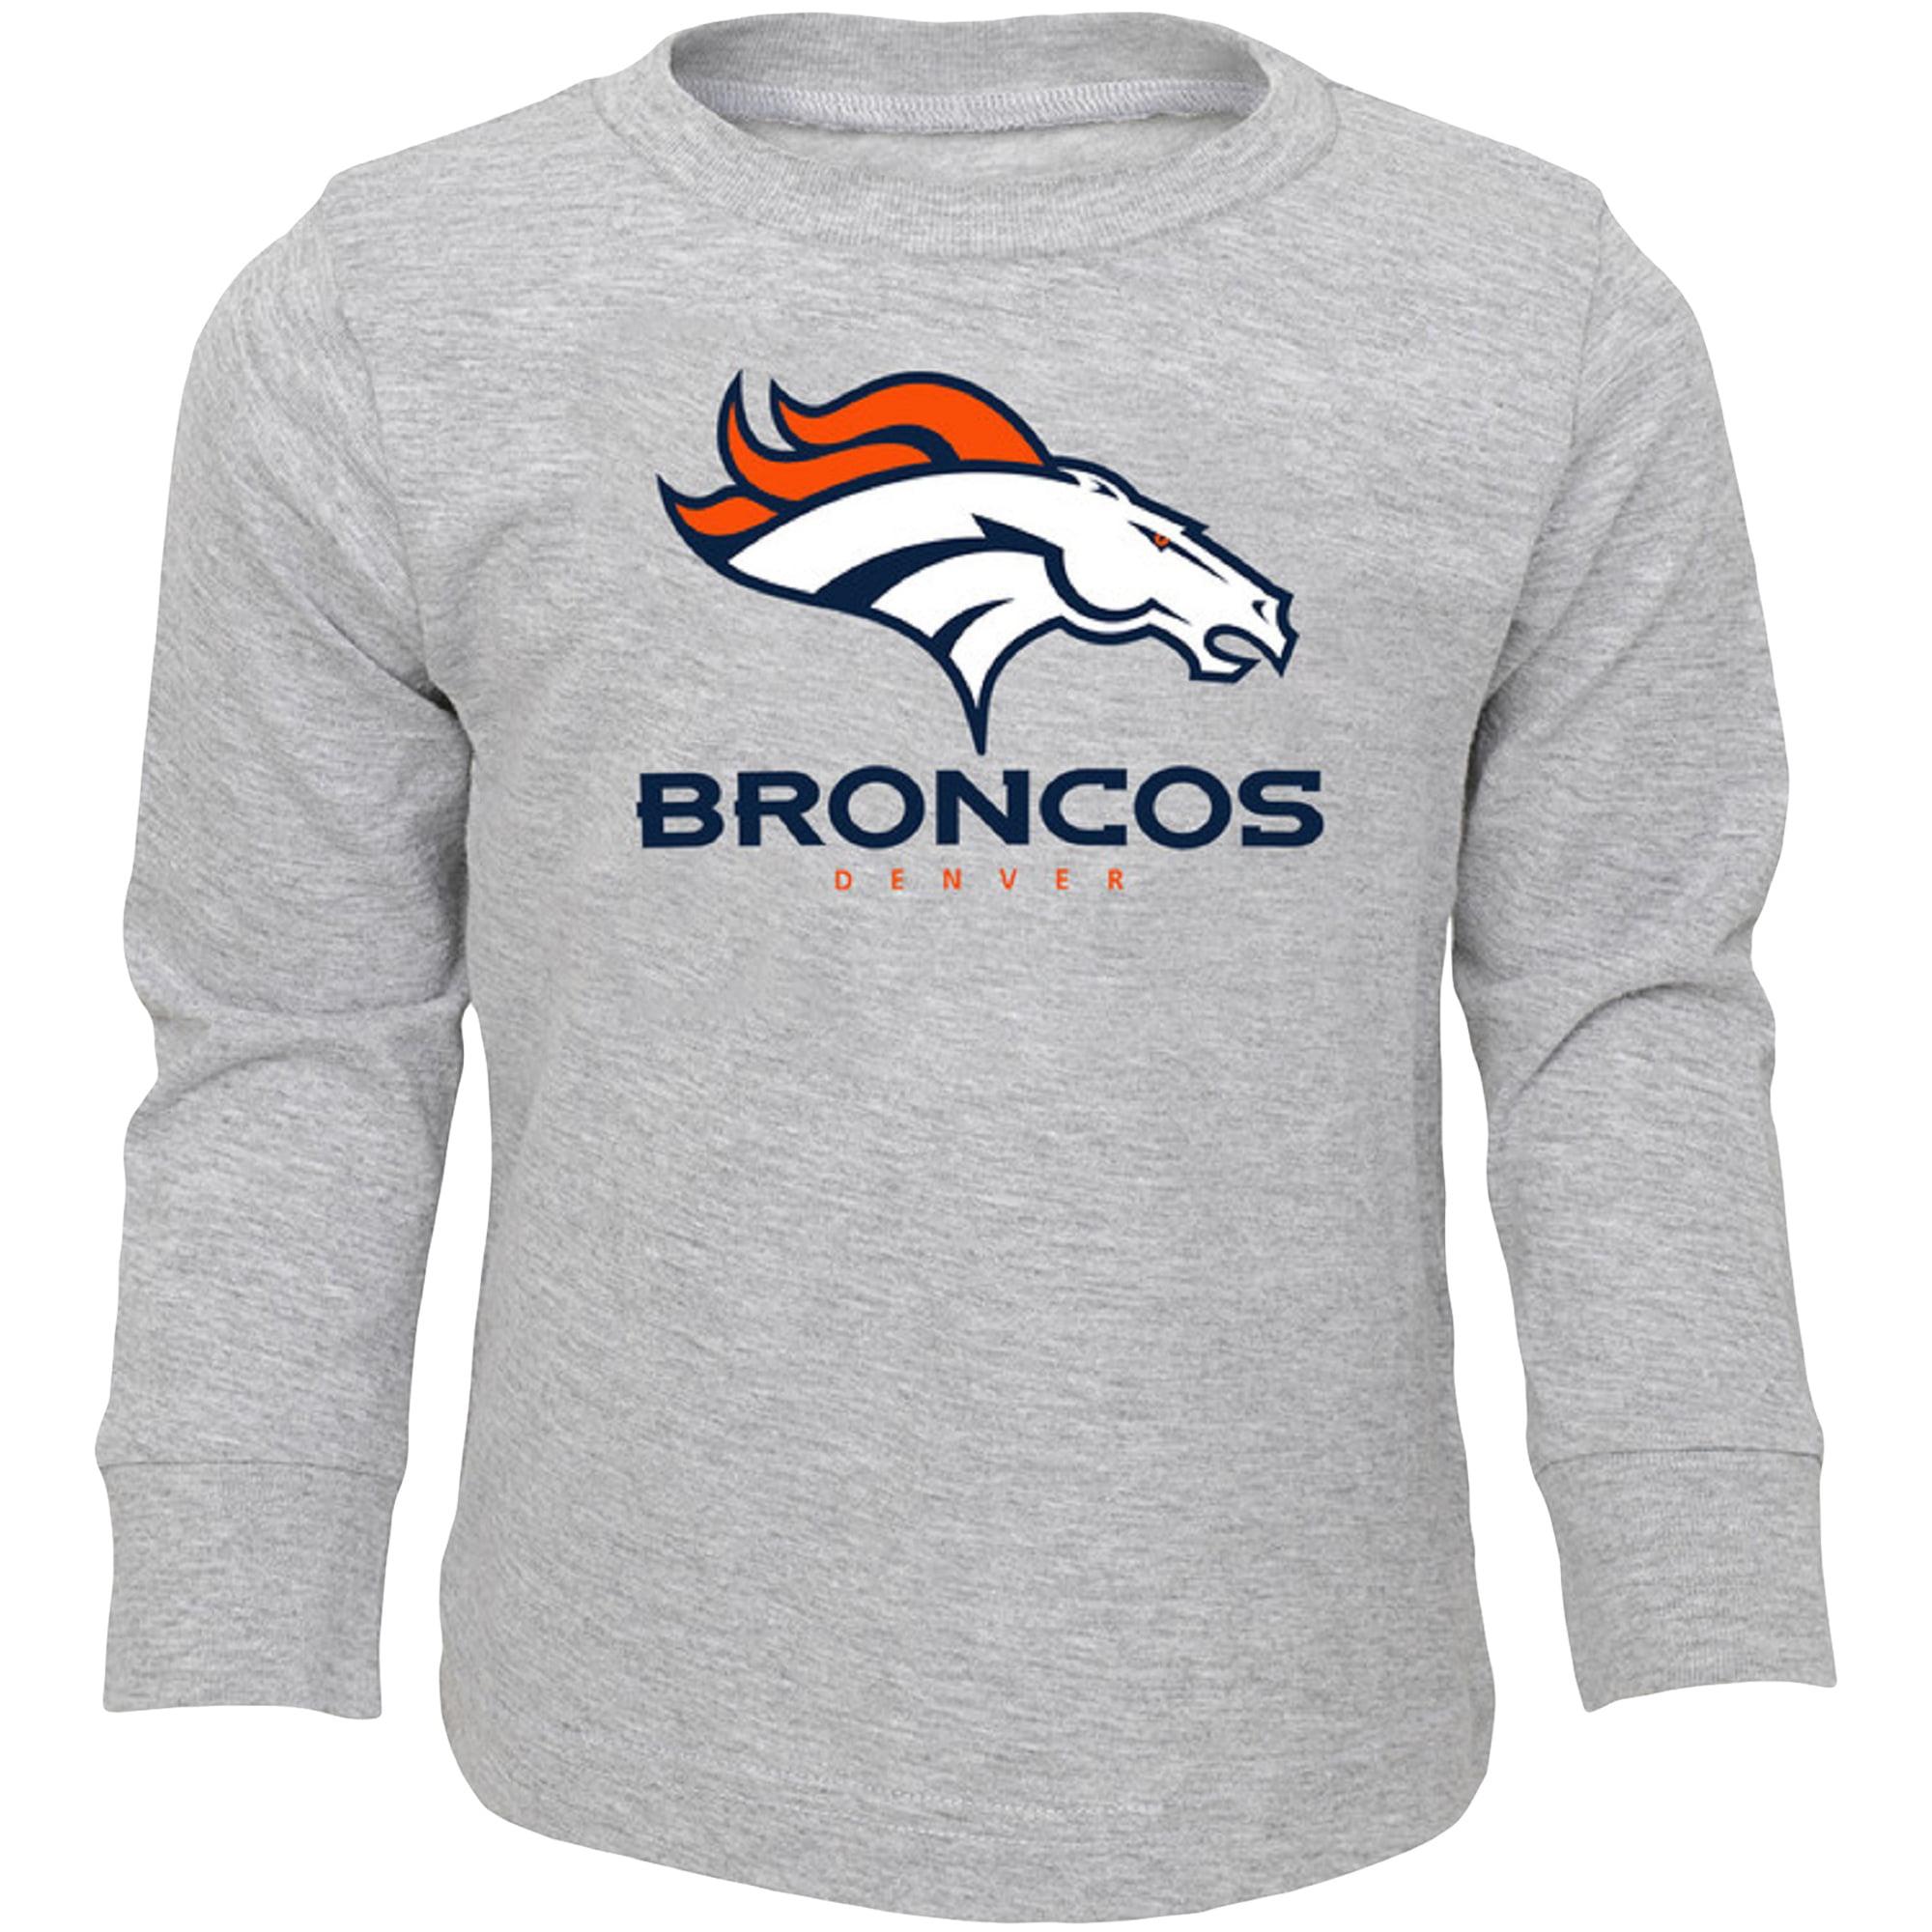 Infant Heathered Gray Denver Broncos Team Long Sleeve T-Shirt